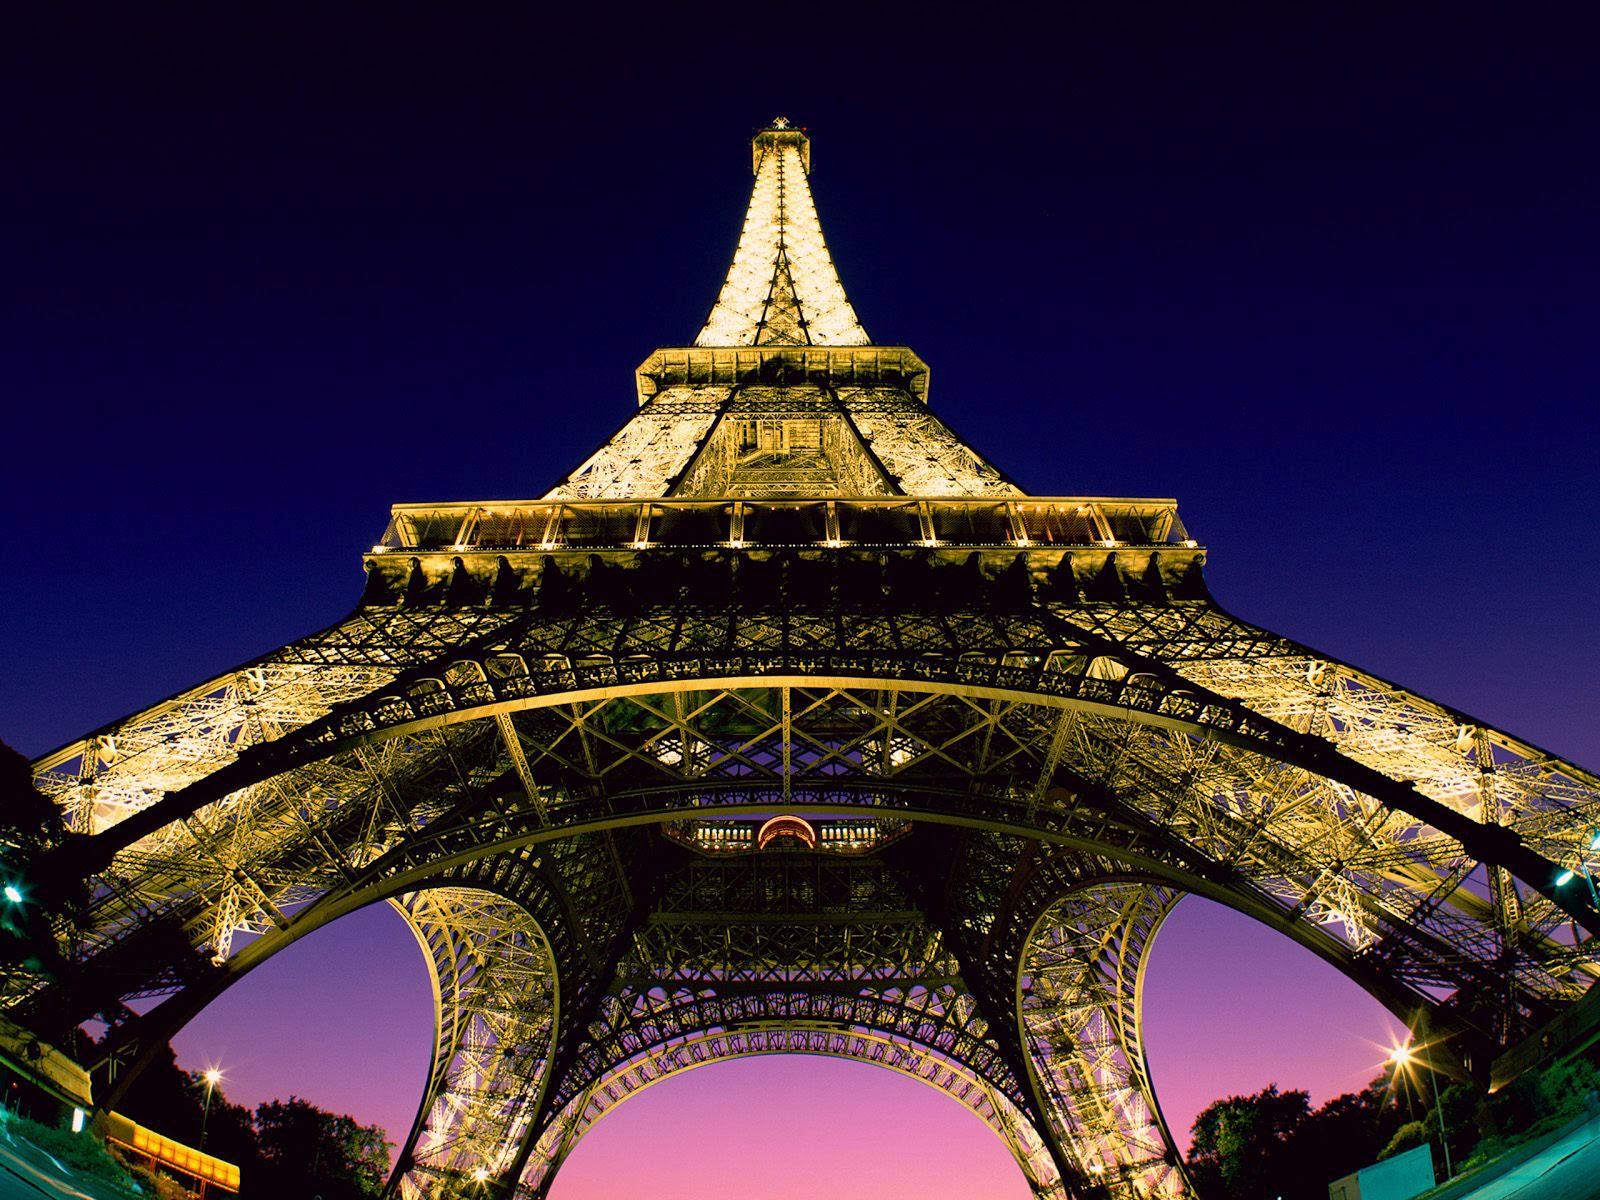 Paris hd wallpapers paris hd wallpapers paris hd wallpapers paris hd